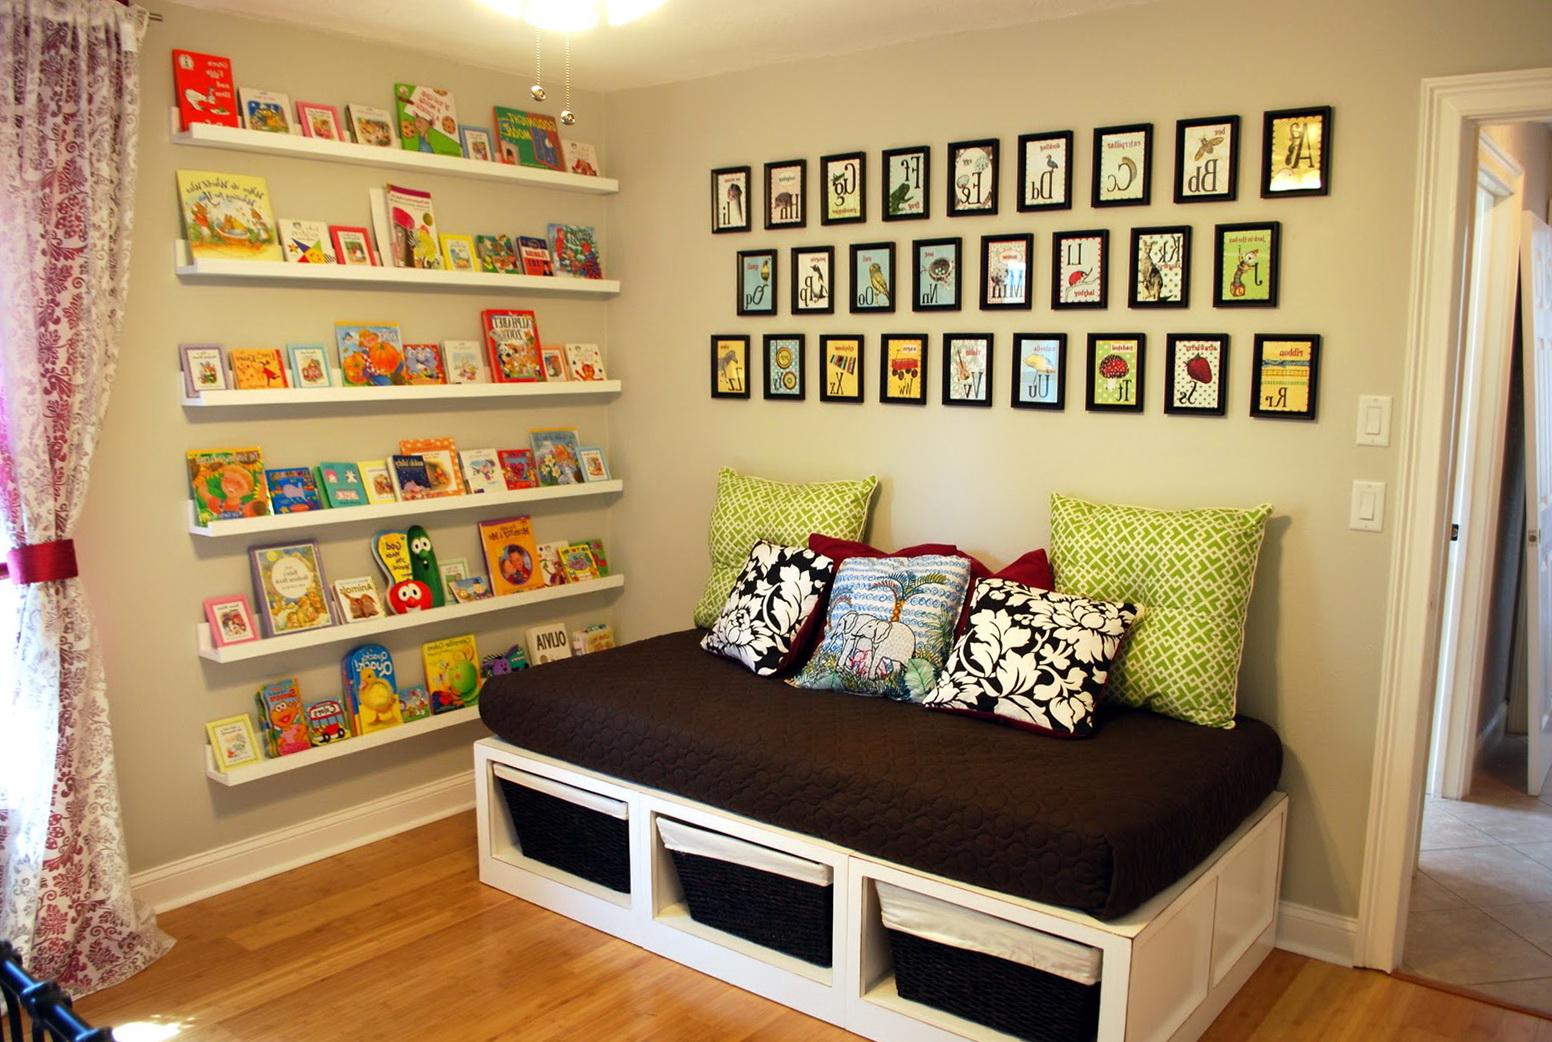 Nursery Wall Mounted Bookshelf | Home Design Ideas